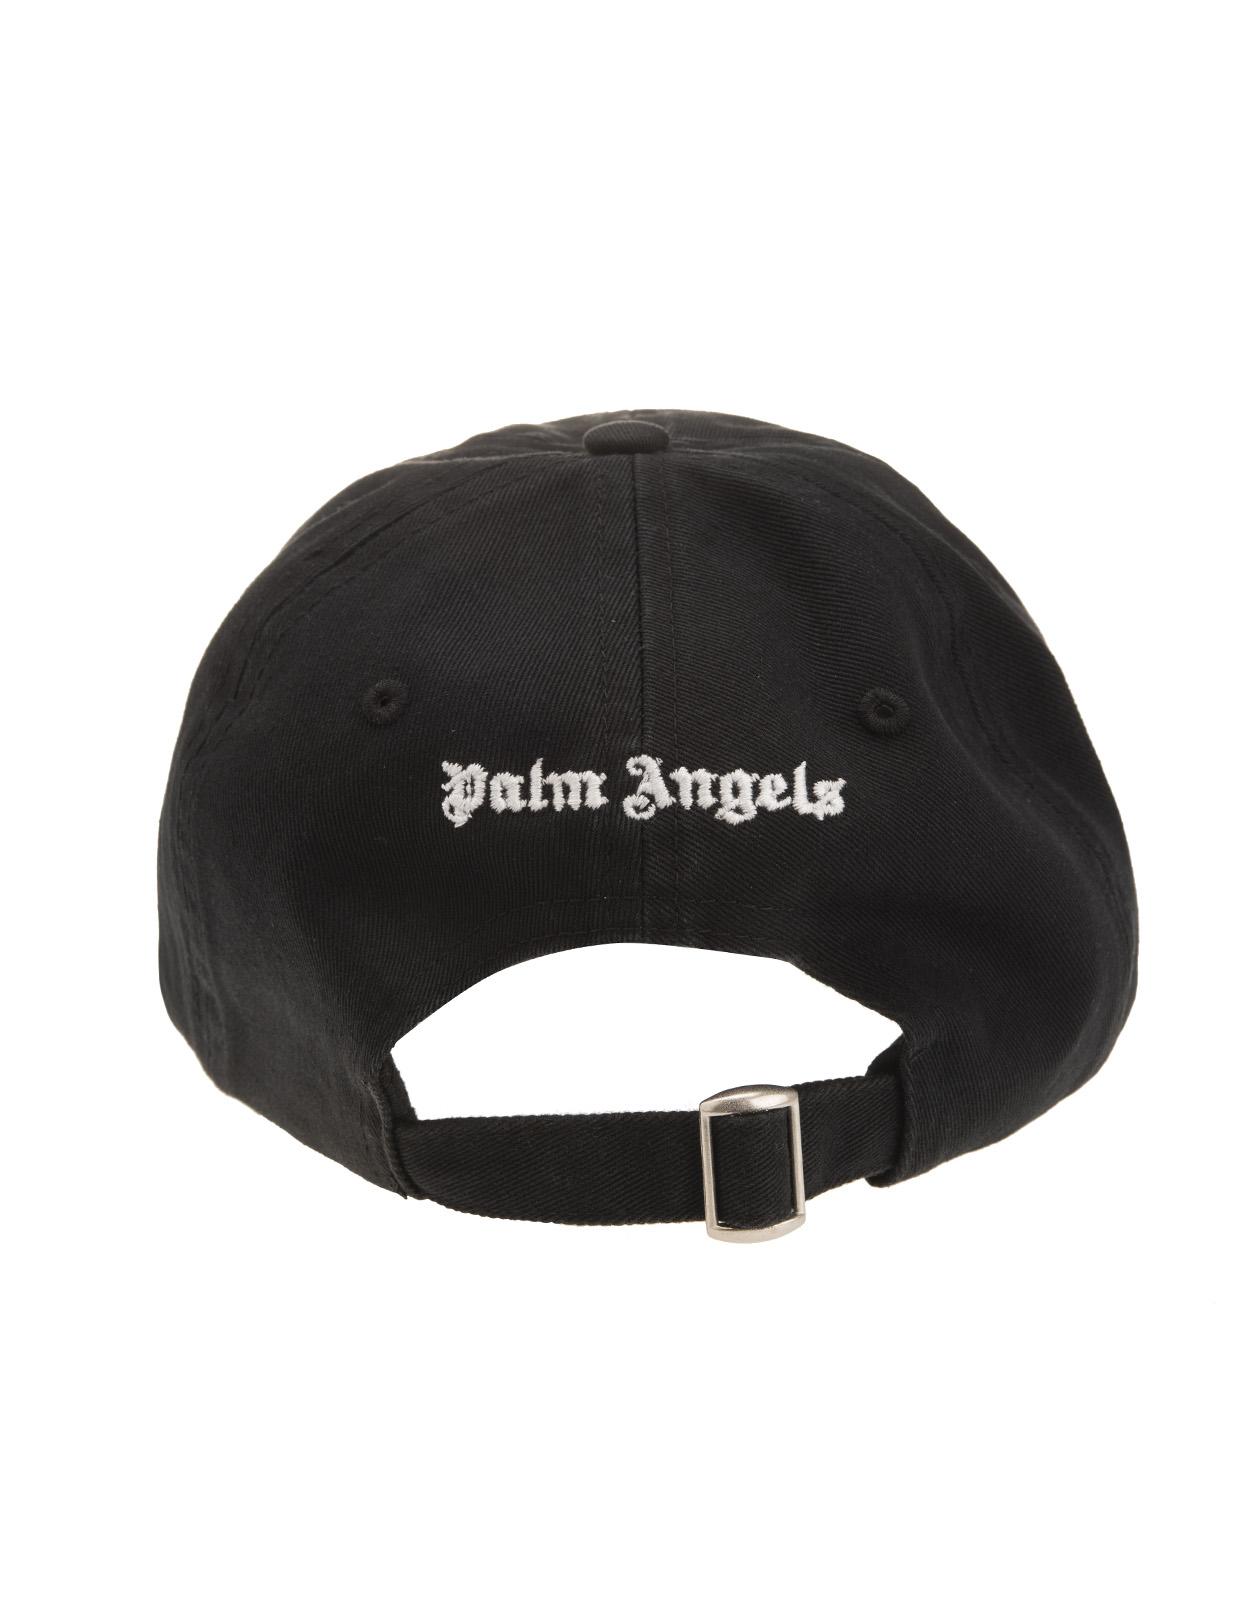 6e02dc59 Black Baseball Cap With White Logo - PALM ANGELS - Russocapri